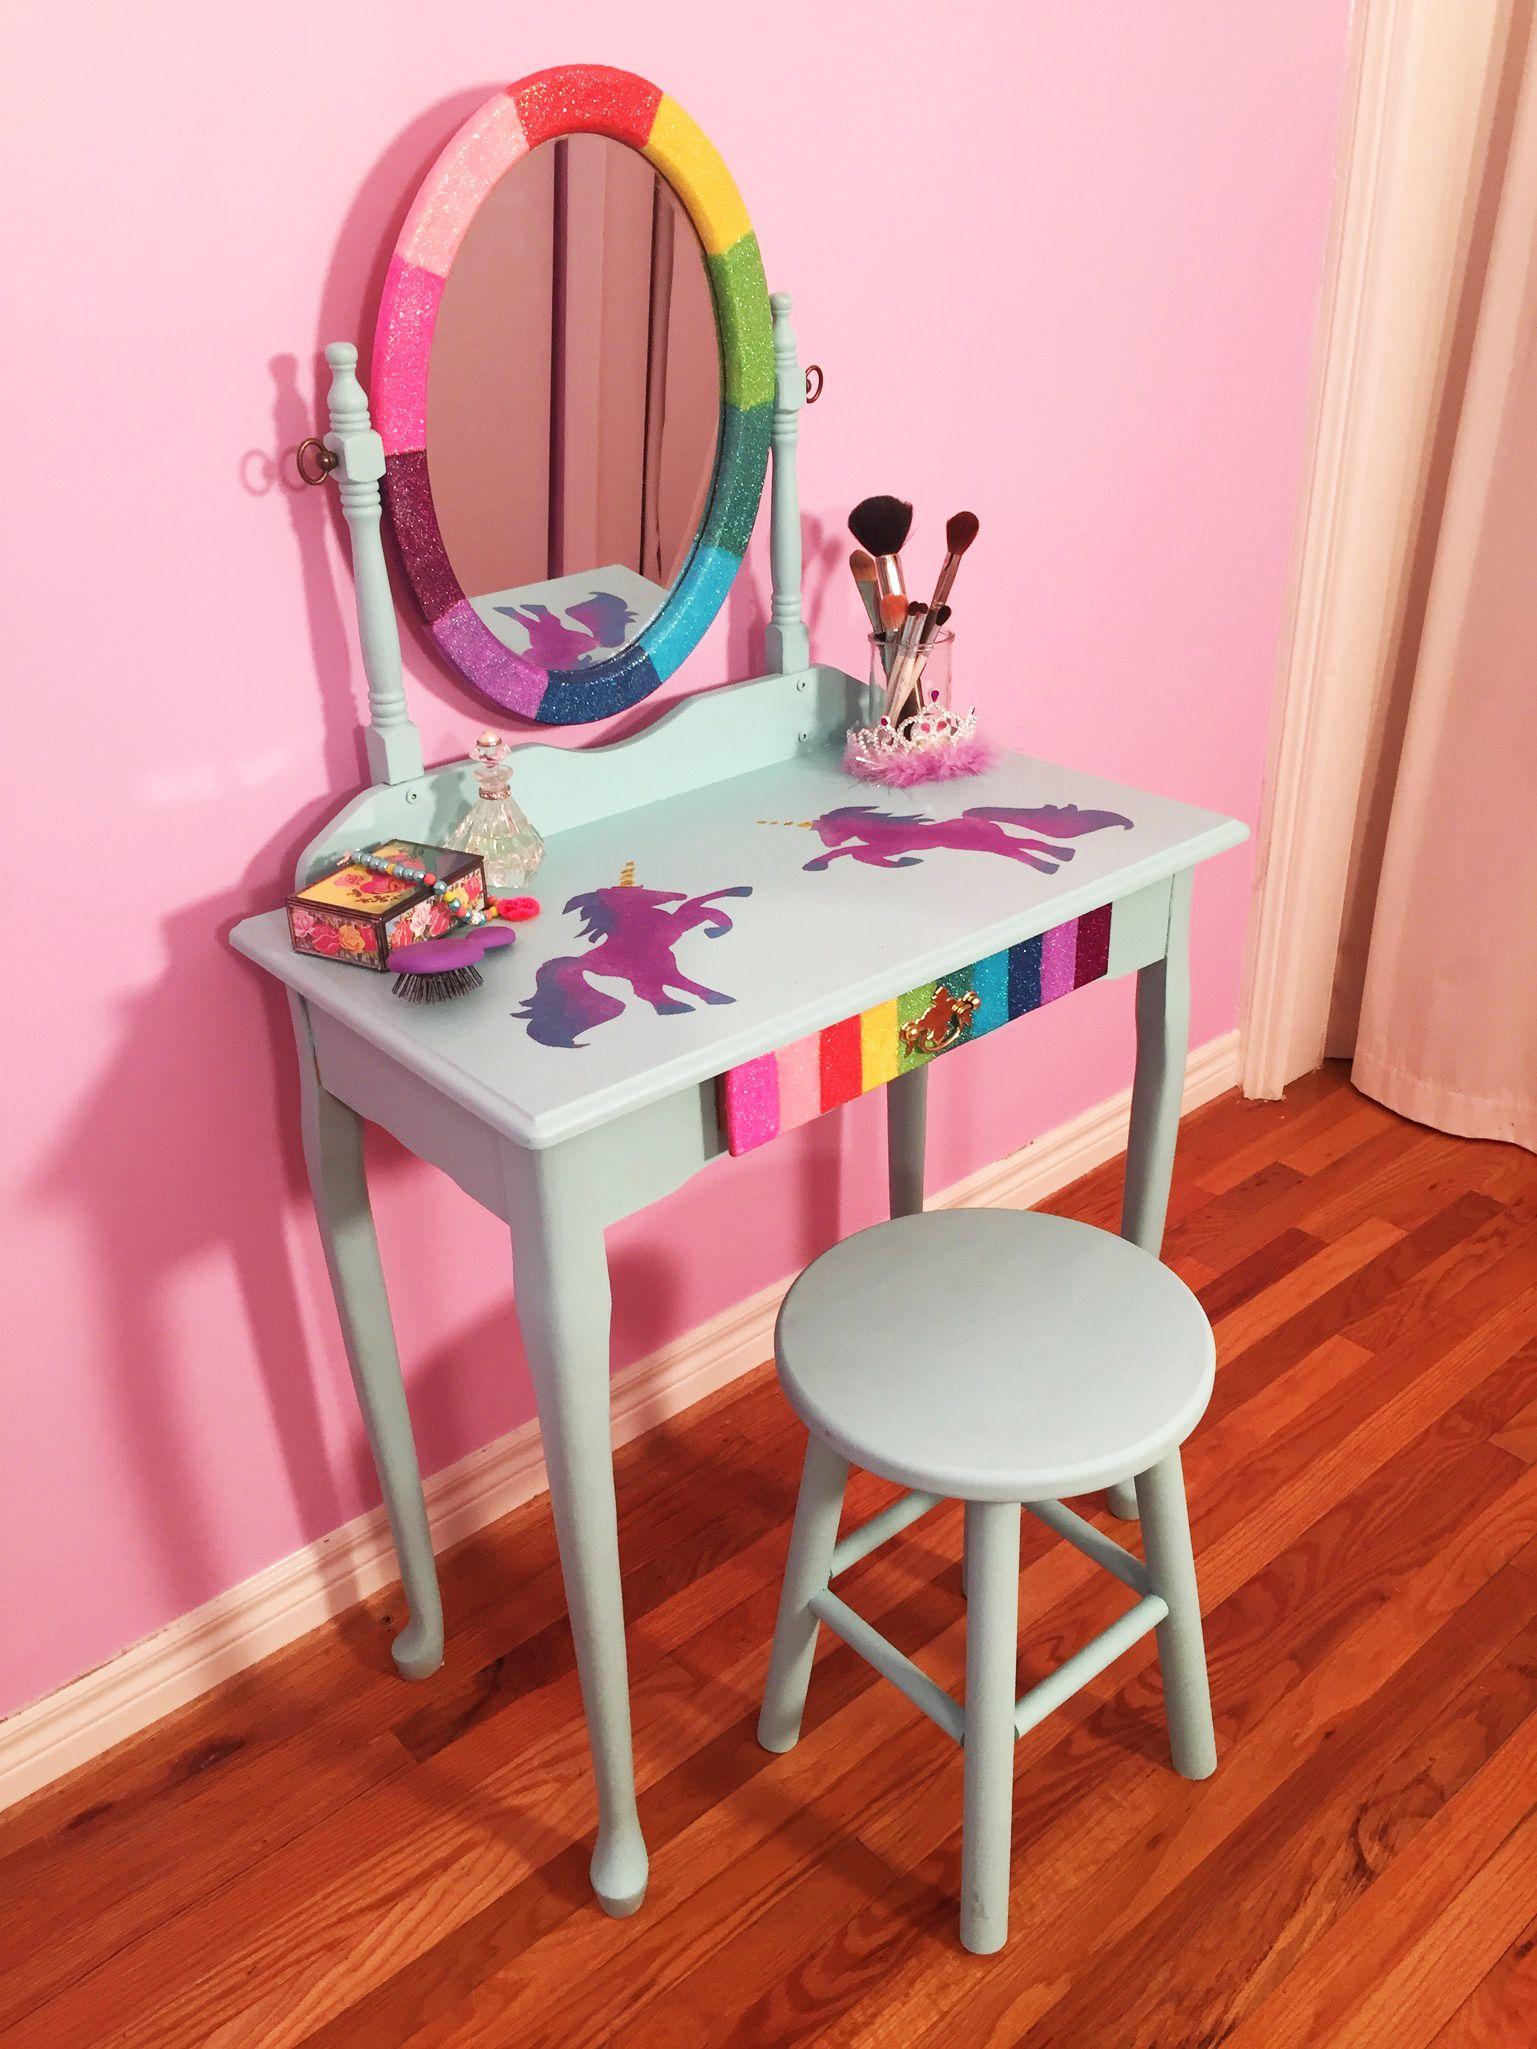 Diy Glitter Rainbow And Galatic Unicorn Makeup Vanity Furniture  # Muebles Rainbow